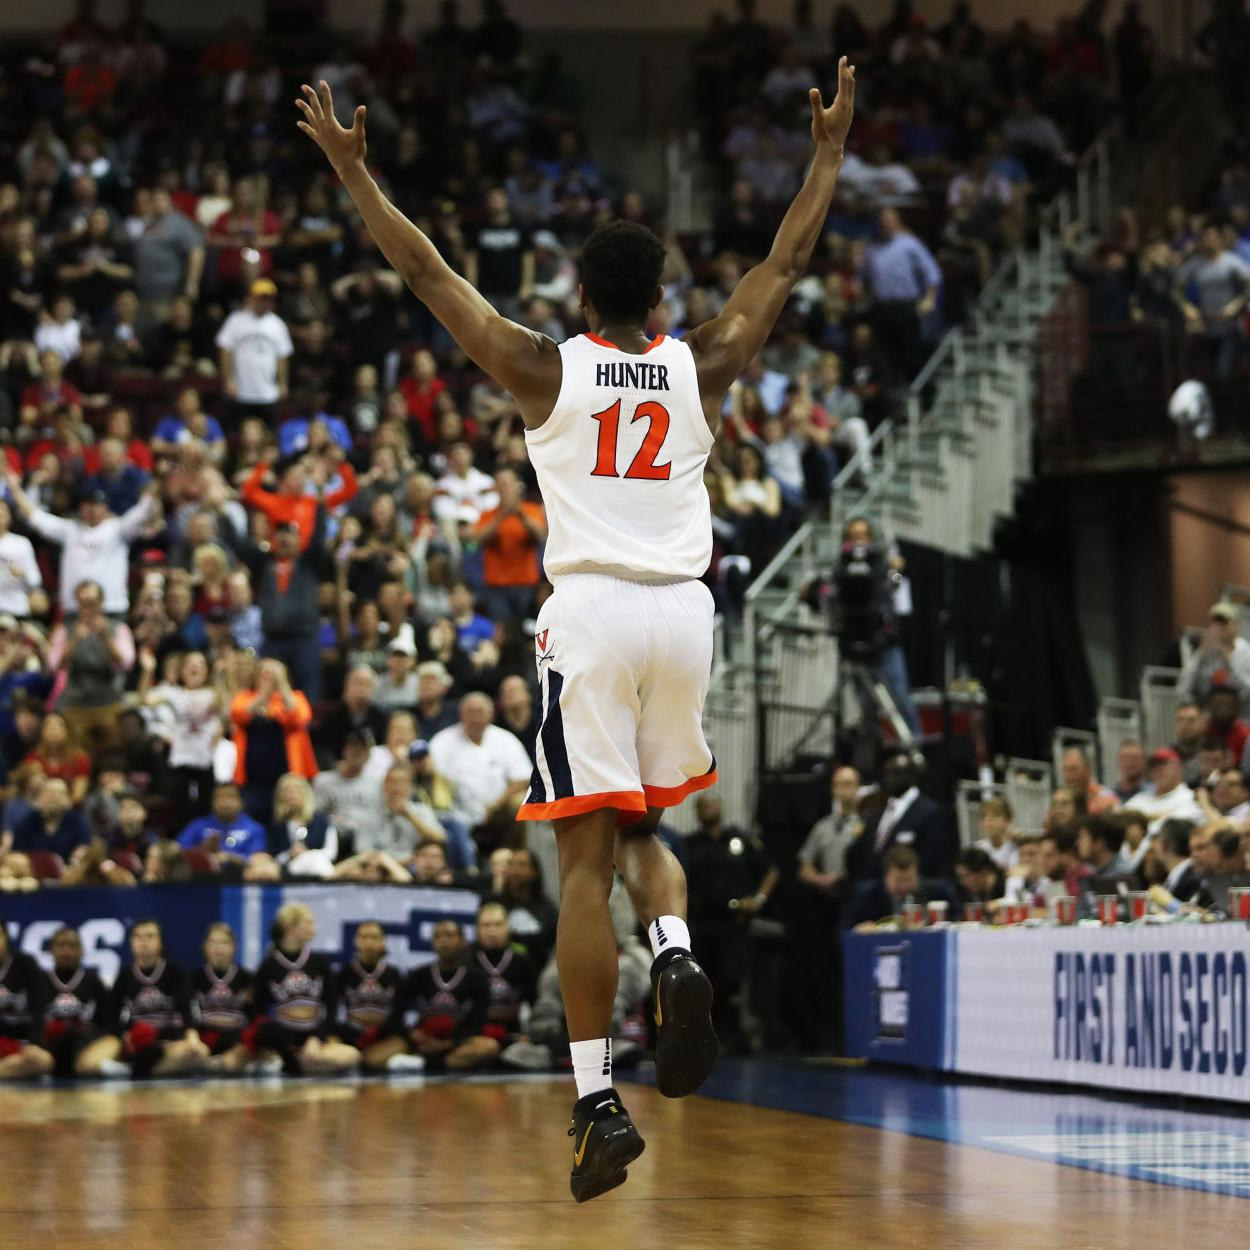 Virginia basketball team overcomes slow start to top Gardner-Webb in NCAA  Tournament  ead3ce2f3